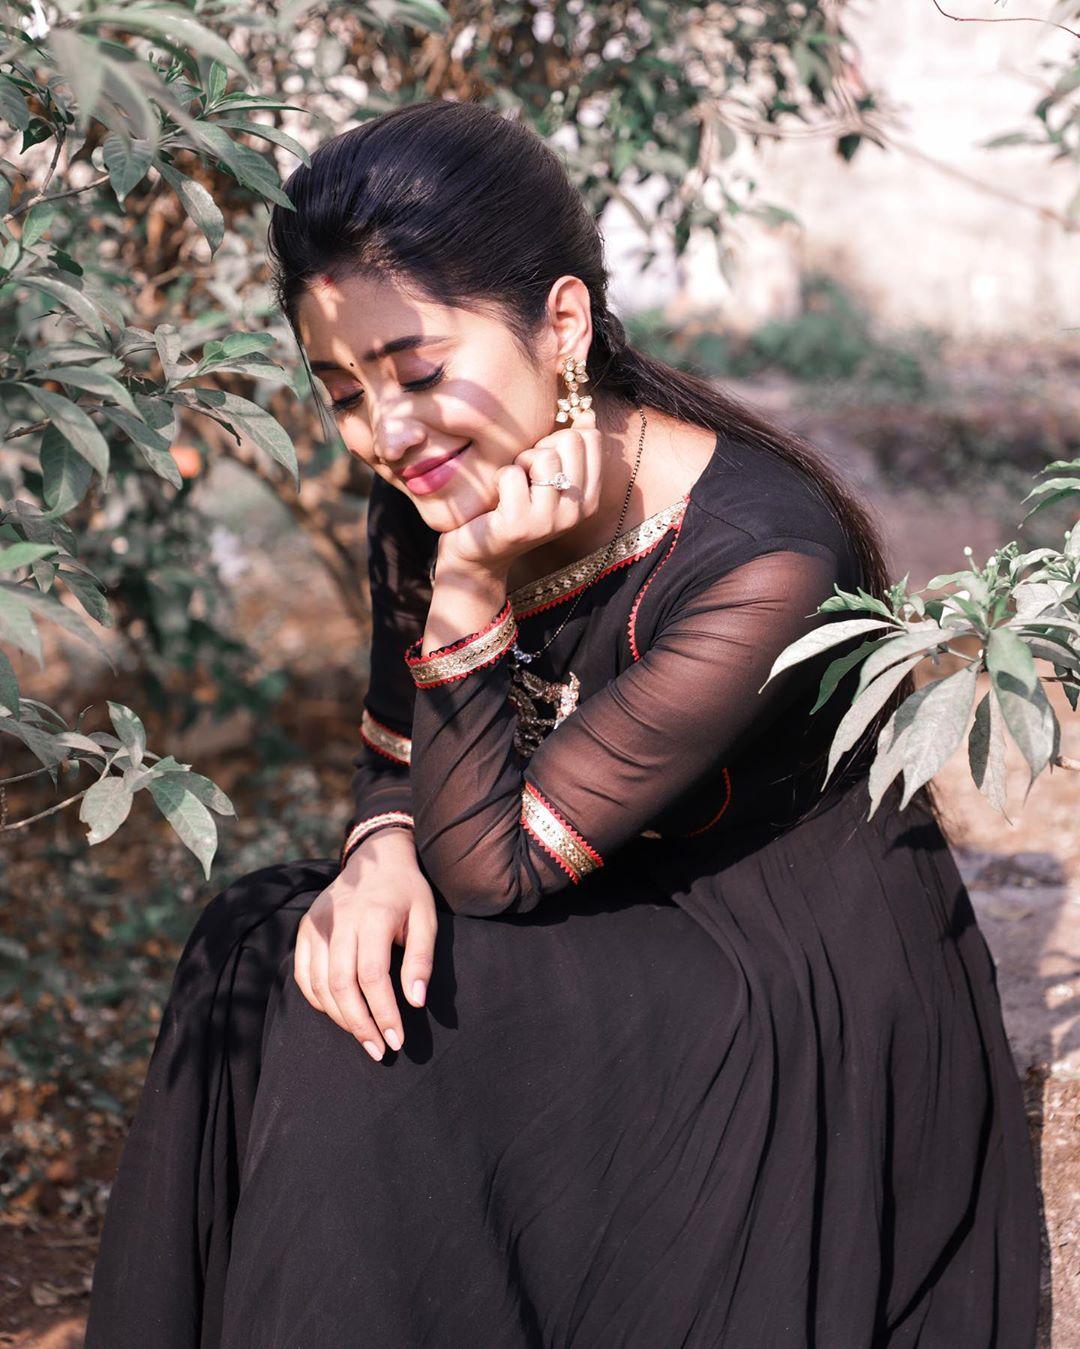 Shivangi Joshi, Divyanka Tripathi, Jasmin Bhasin's Casual Silk Outfits Are All You Need This Monsoon Season!